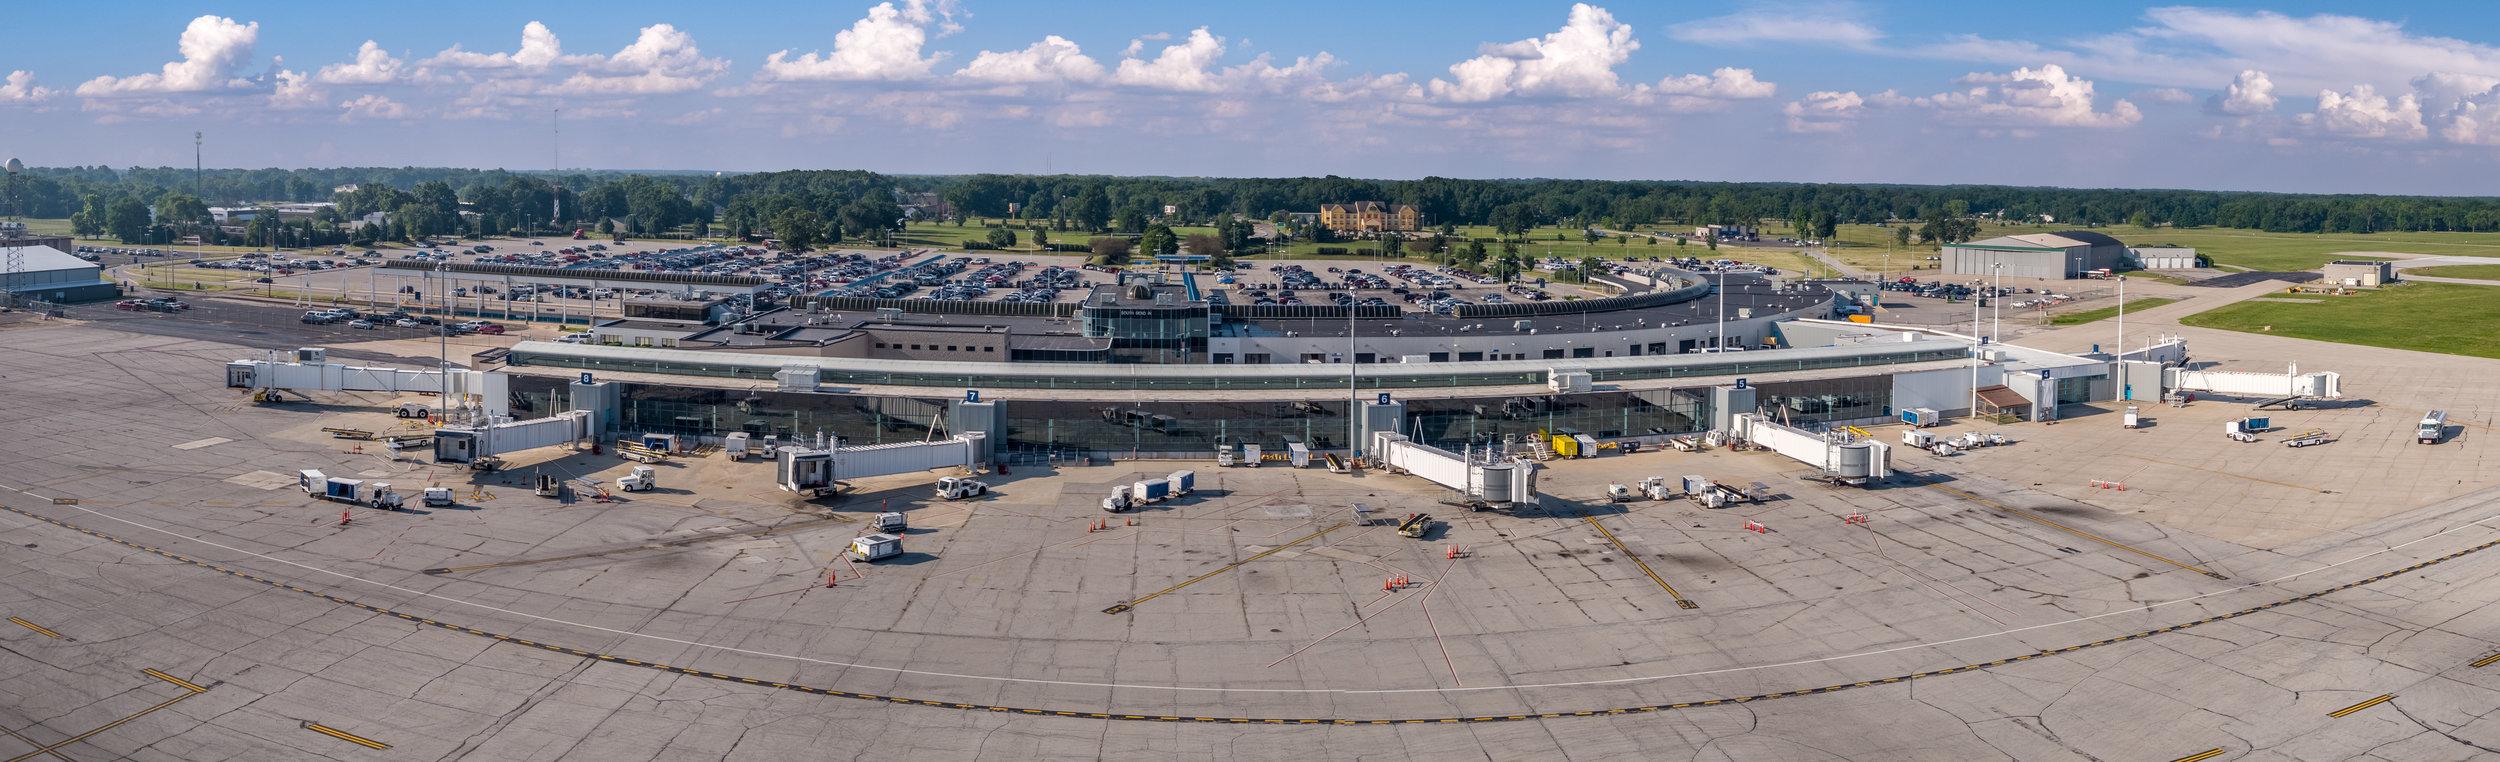 South Bend International Airport Terminal Built by Majority Builders Inc.-1.jpg